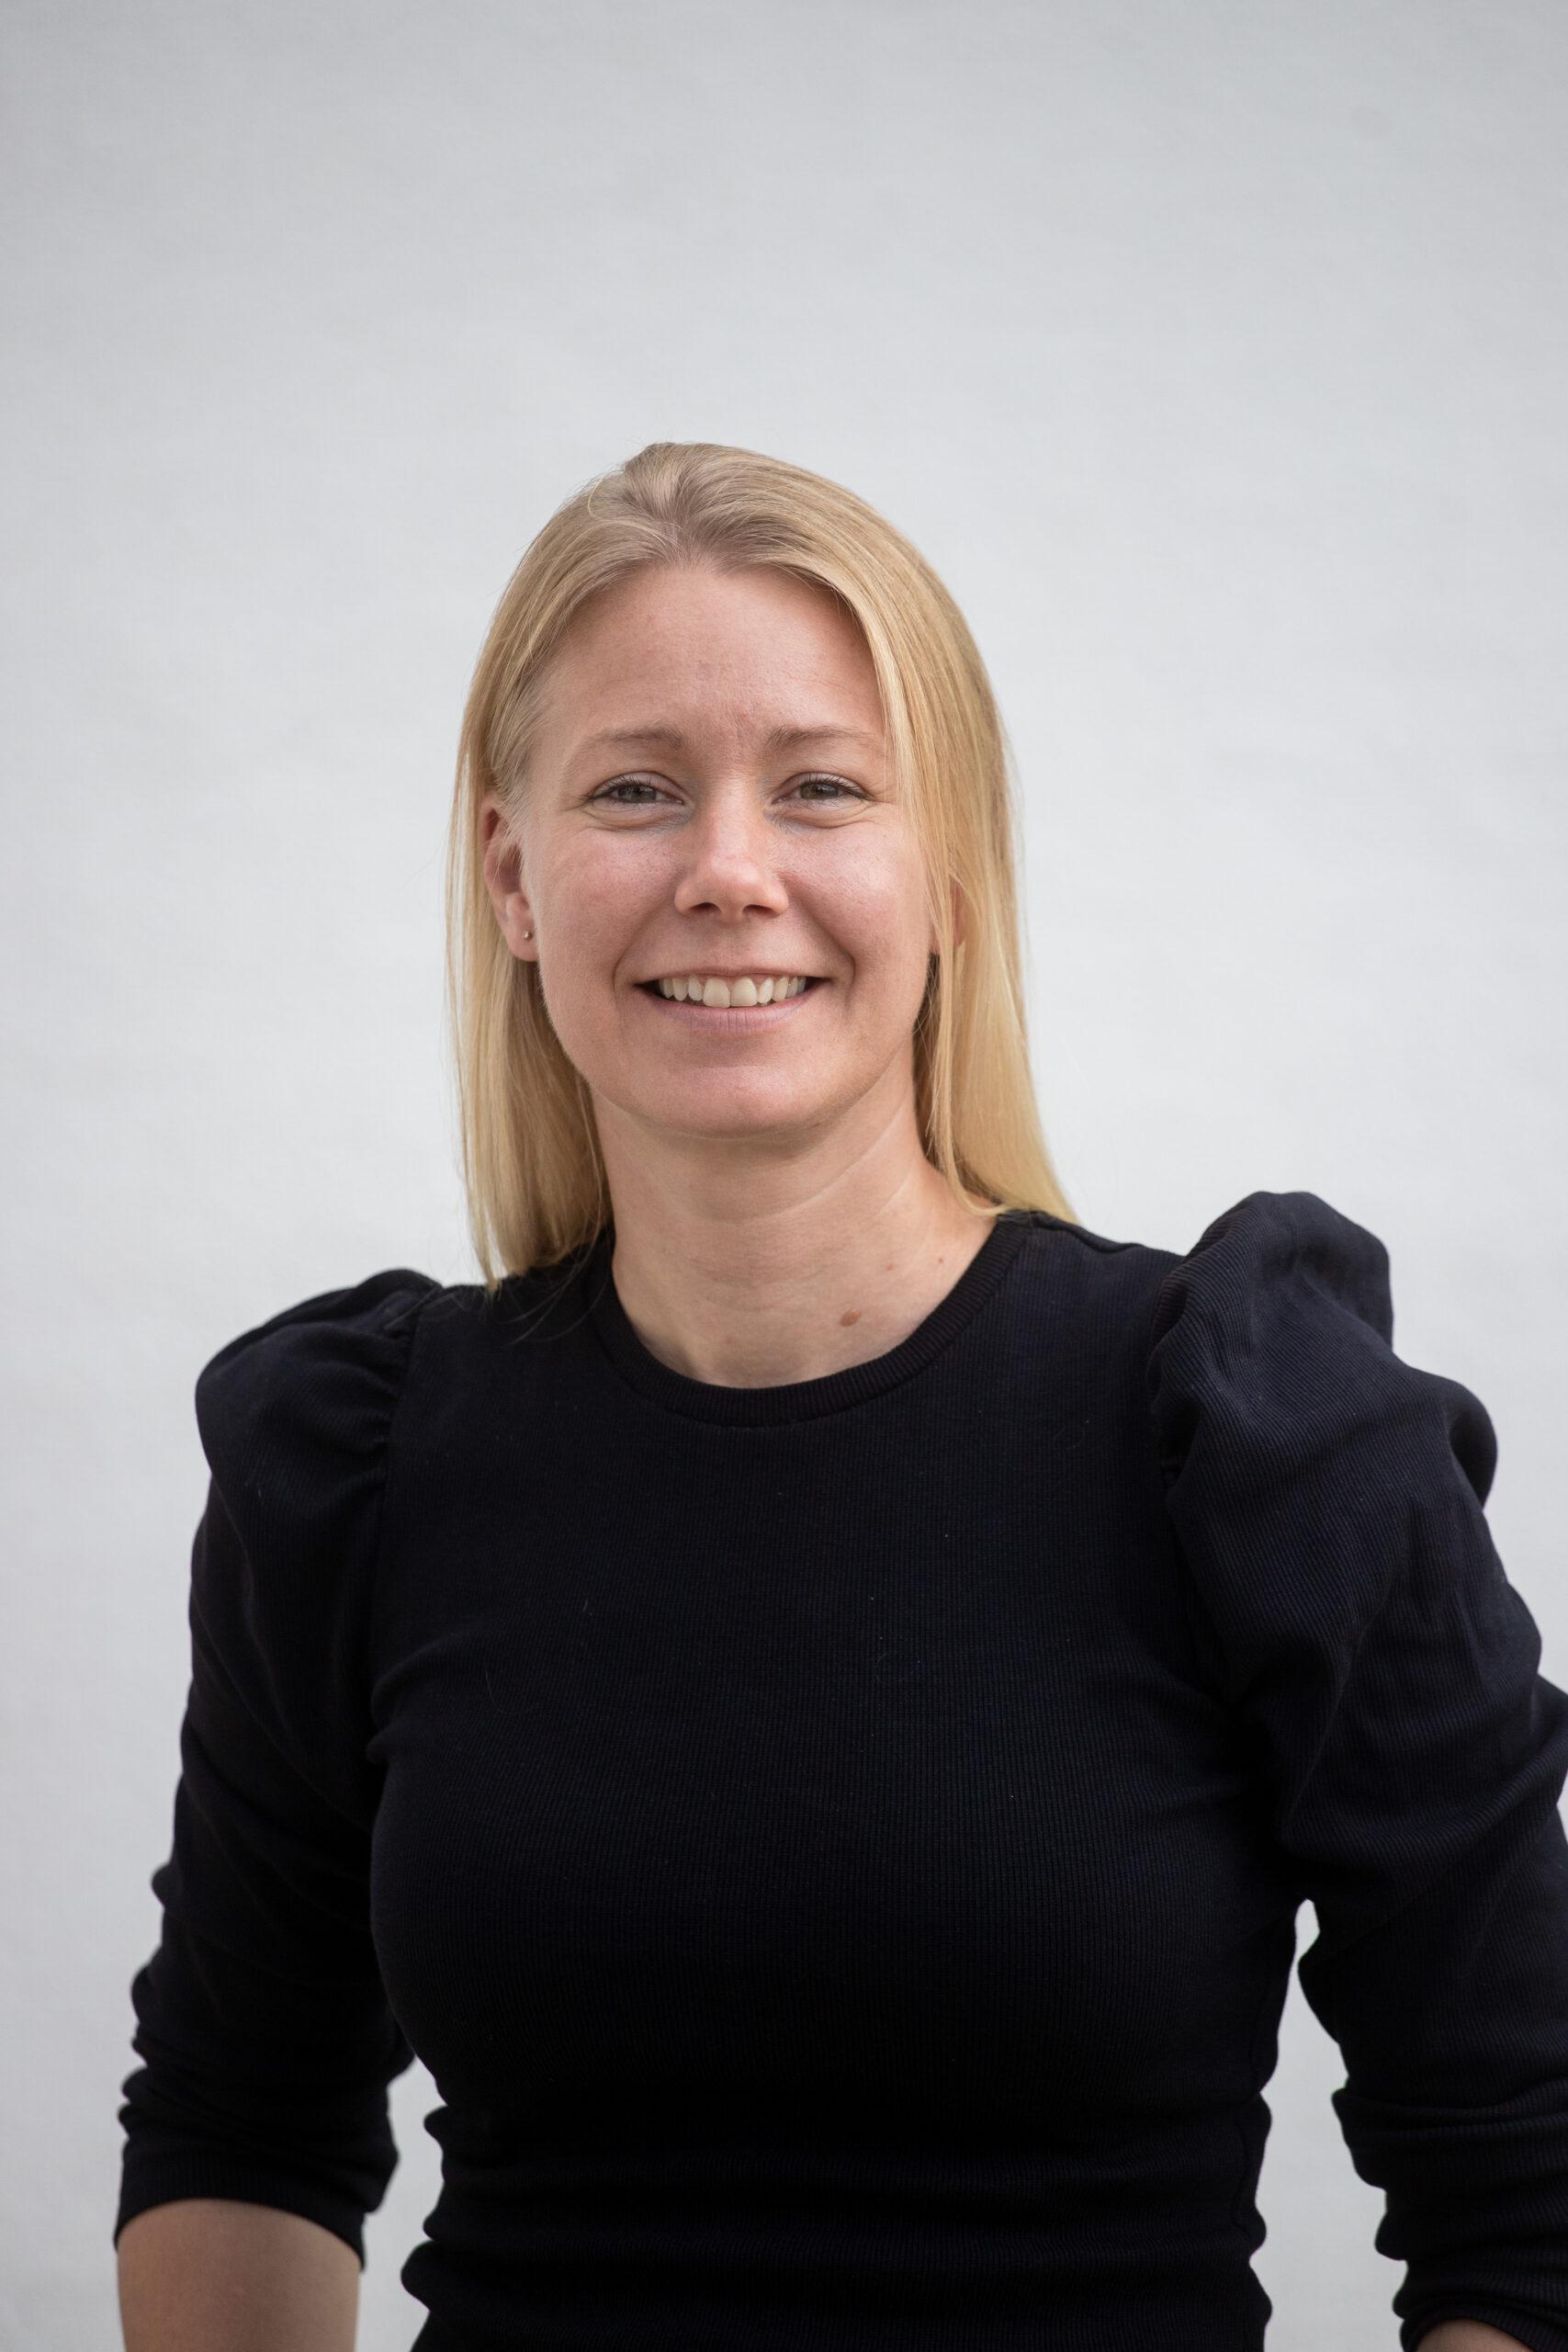 Camilla Svinth Vogel